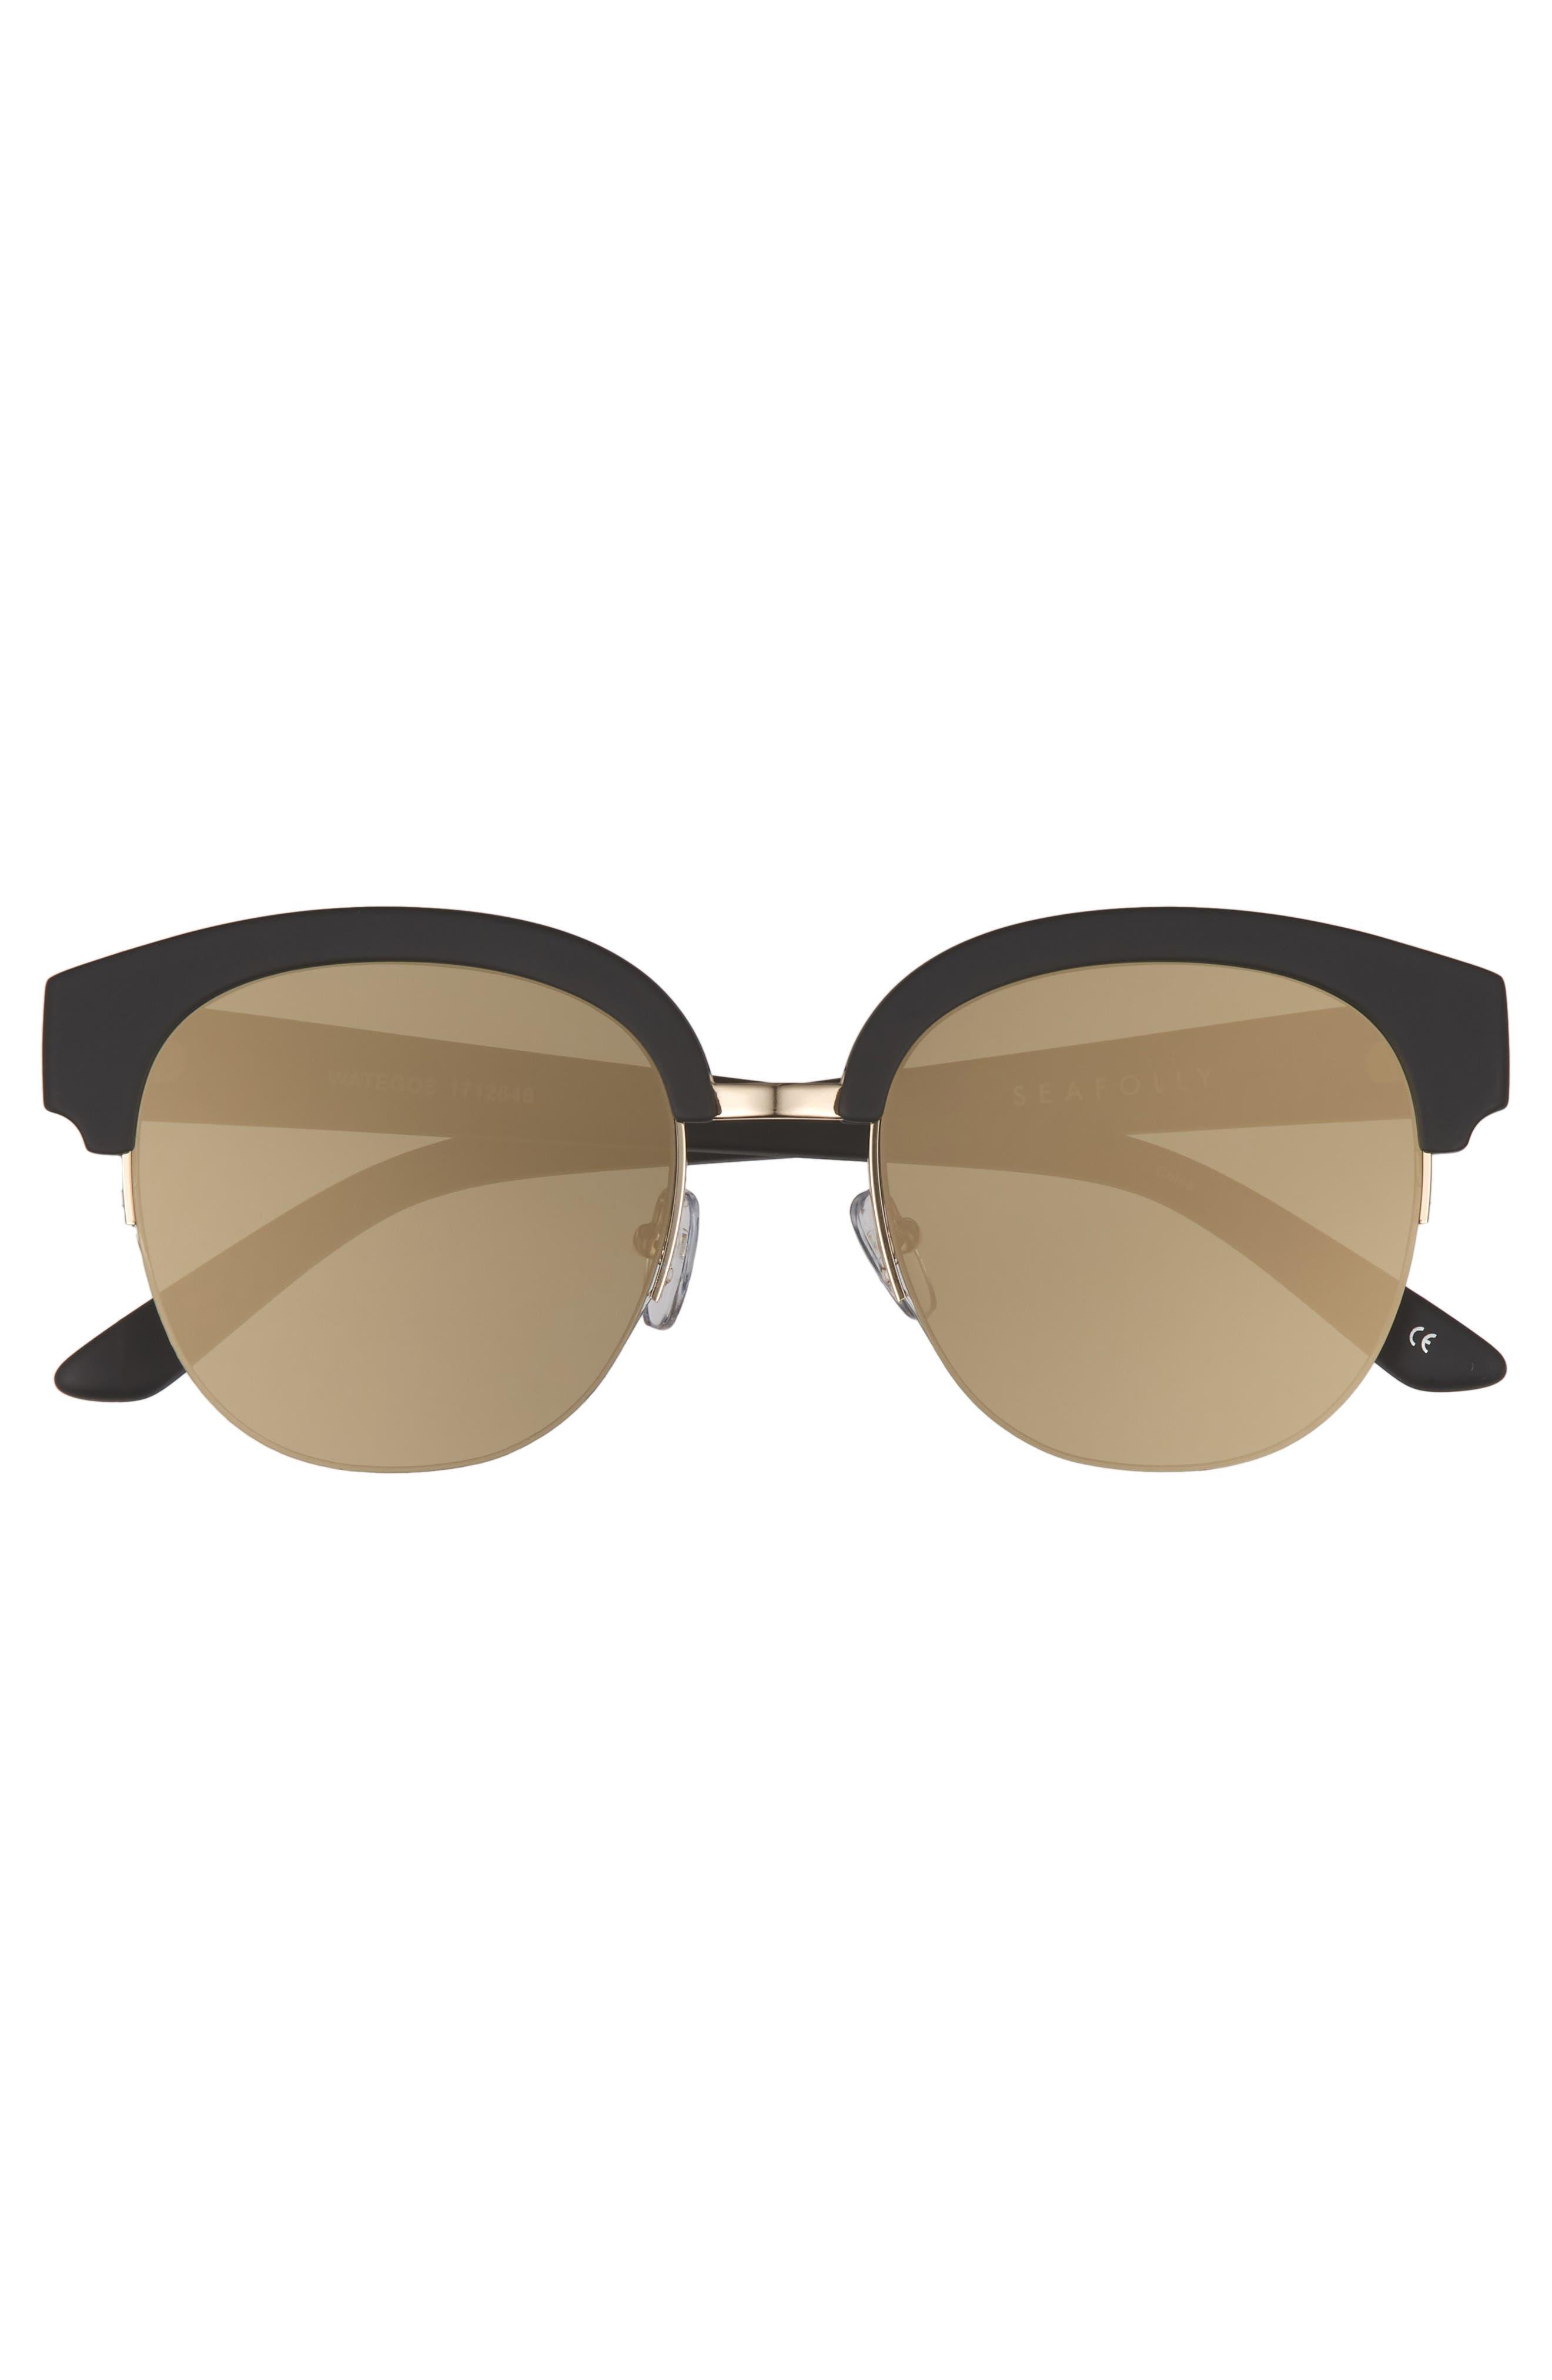 Wategos 53mm Cat Eye Sunglasses,                             Alternate thumbnail 3, color,                             Black